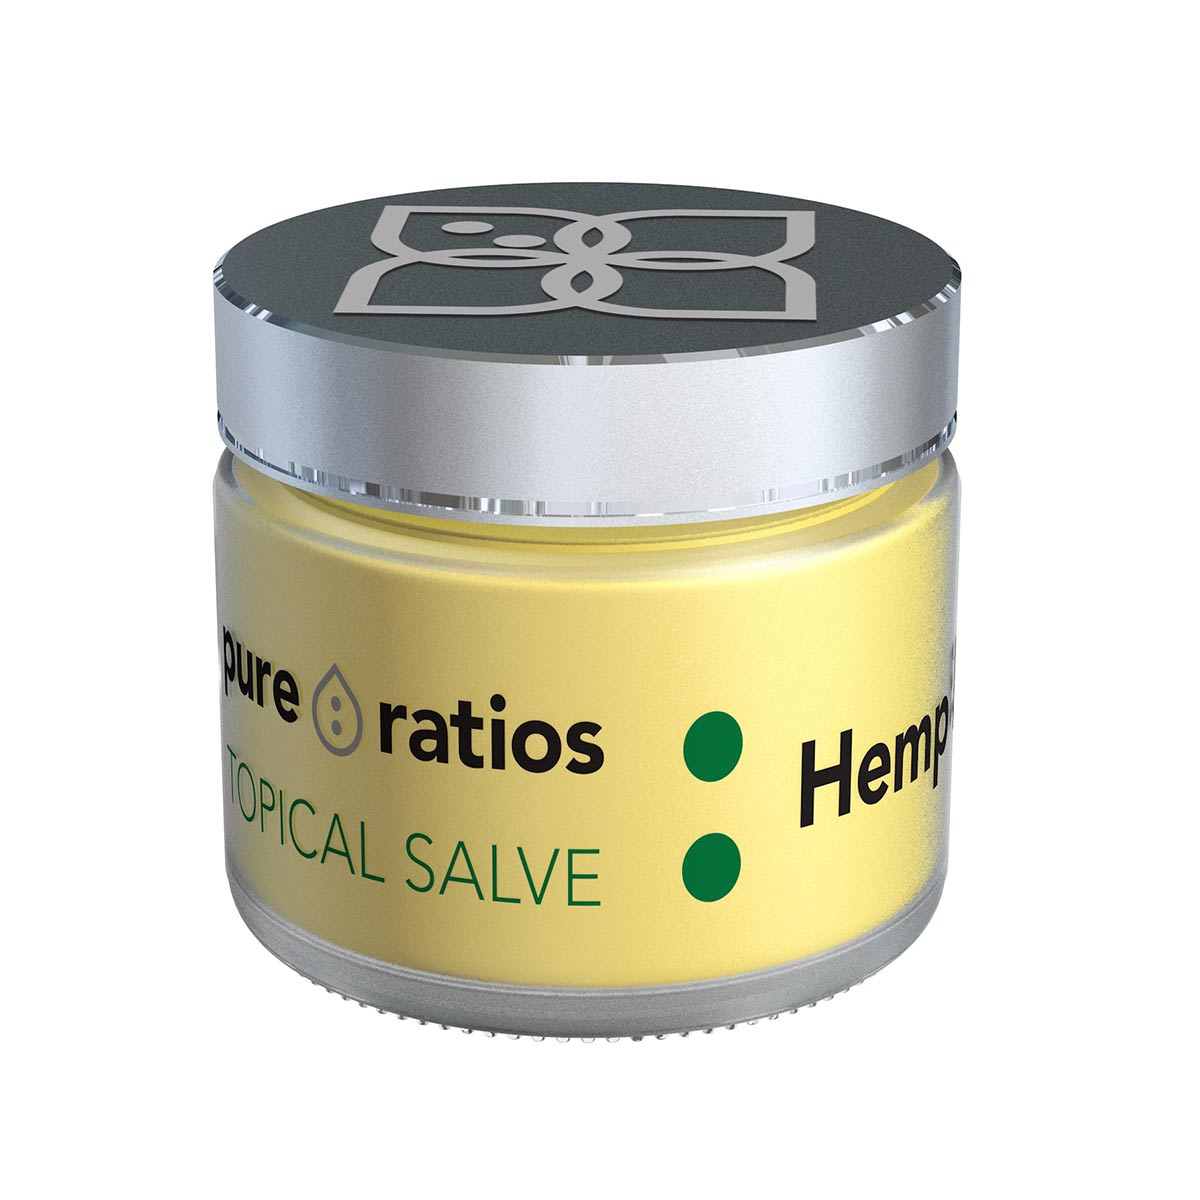 Pure Ratios, Hemp Extract Topical Salve, 1.7oz